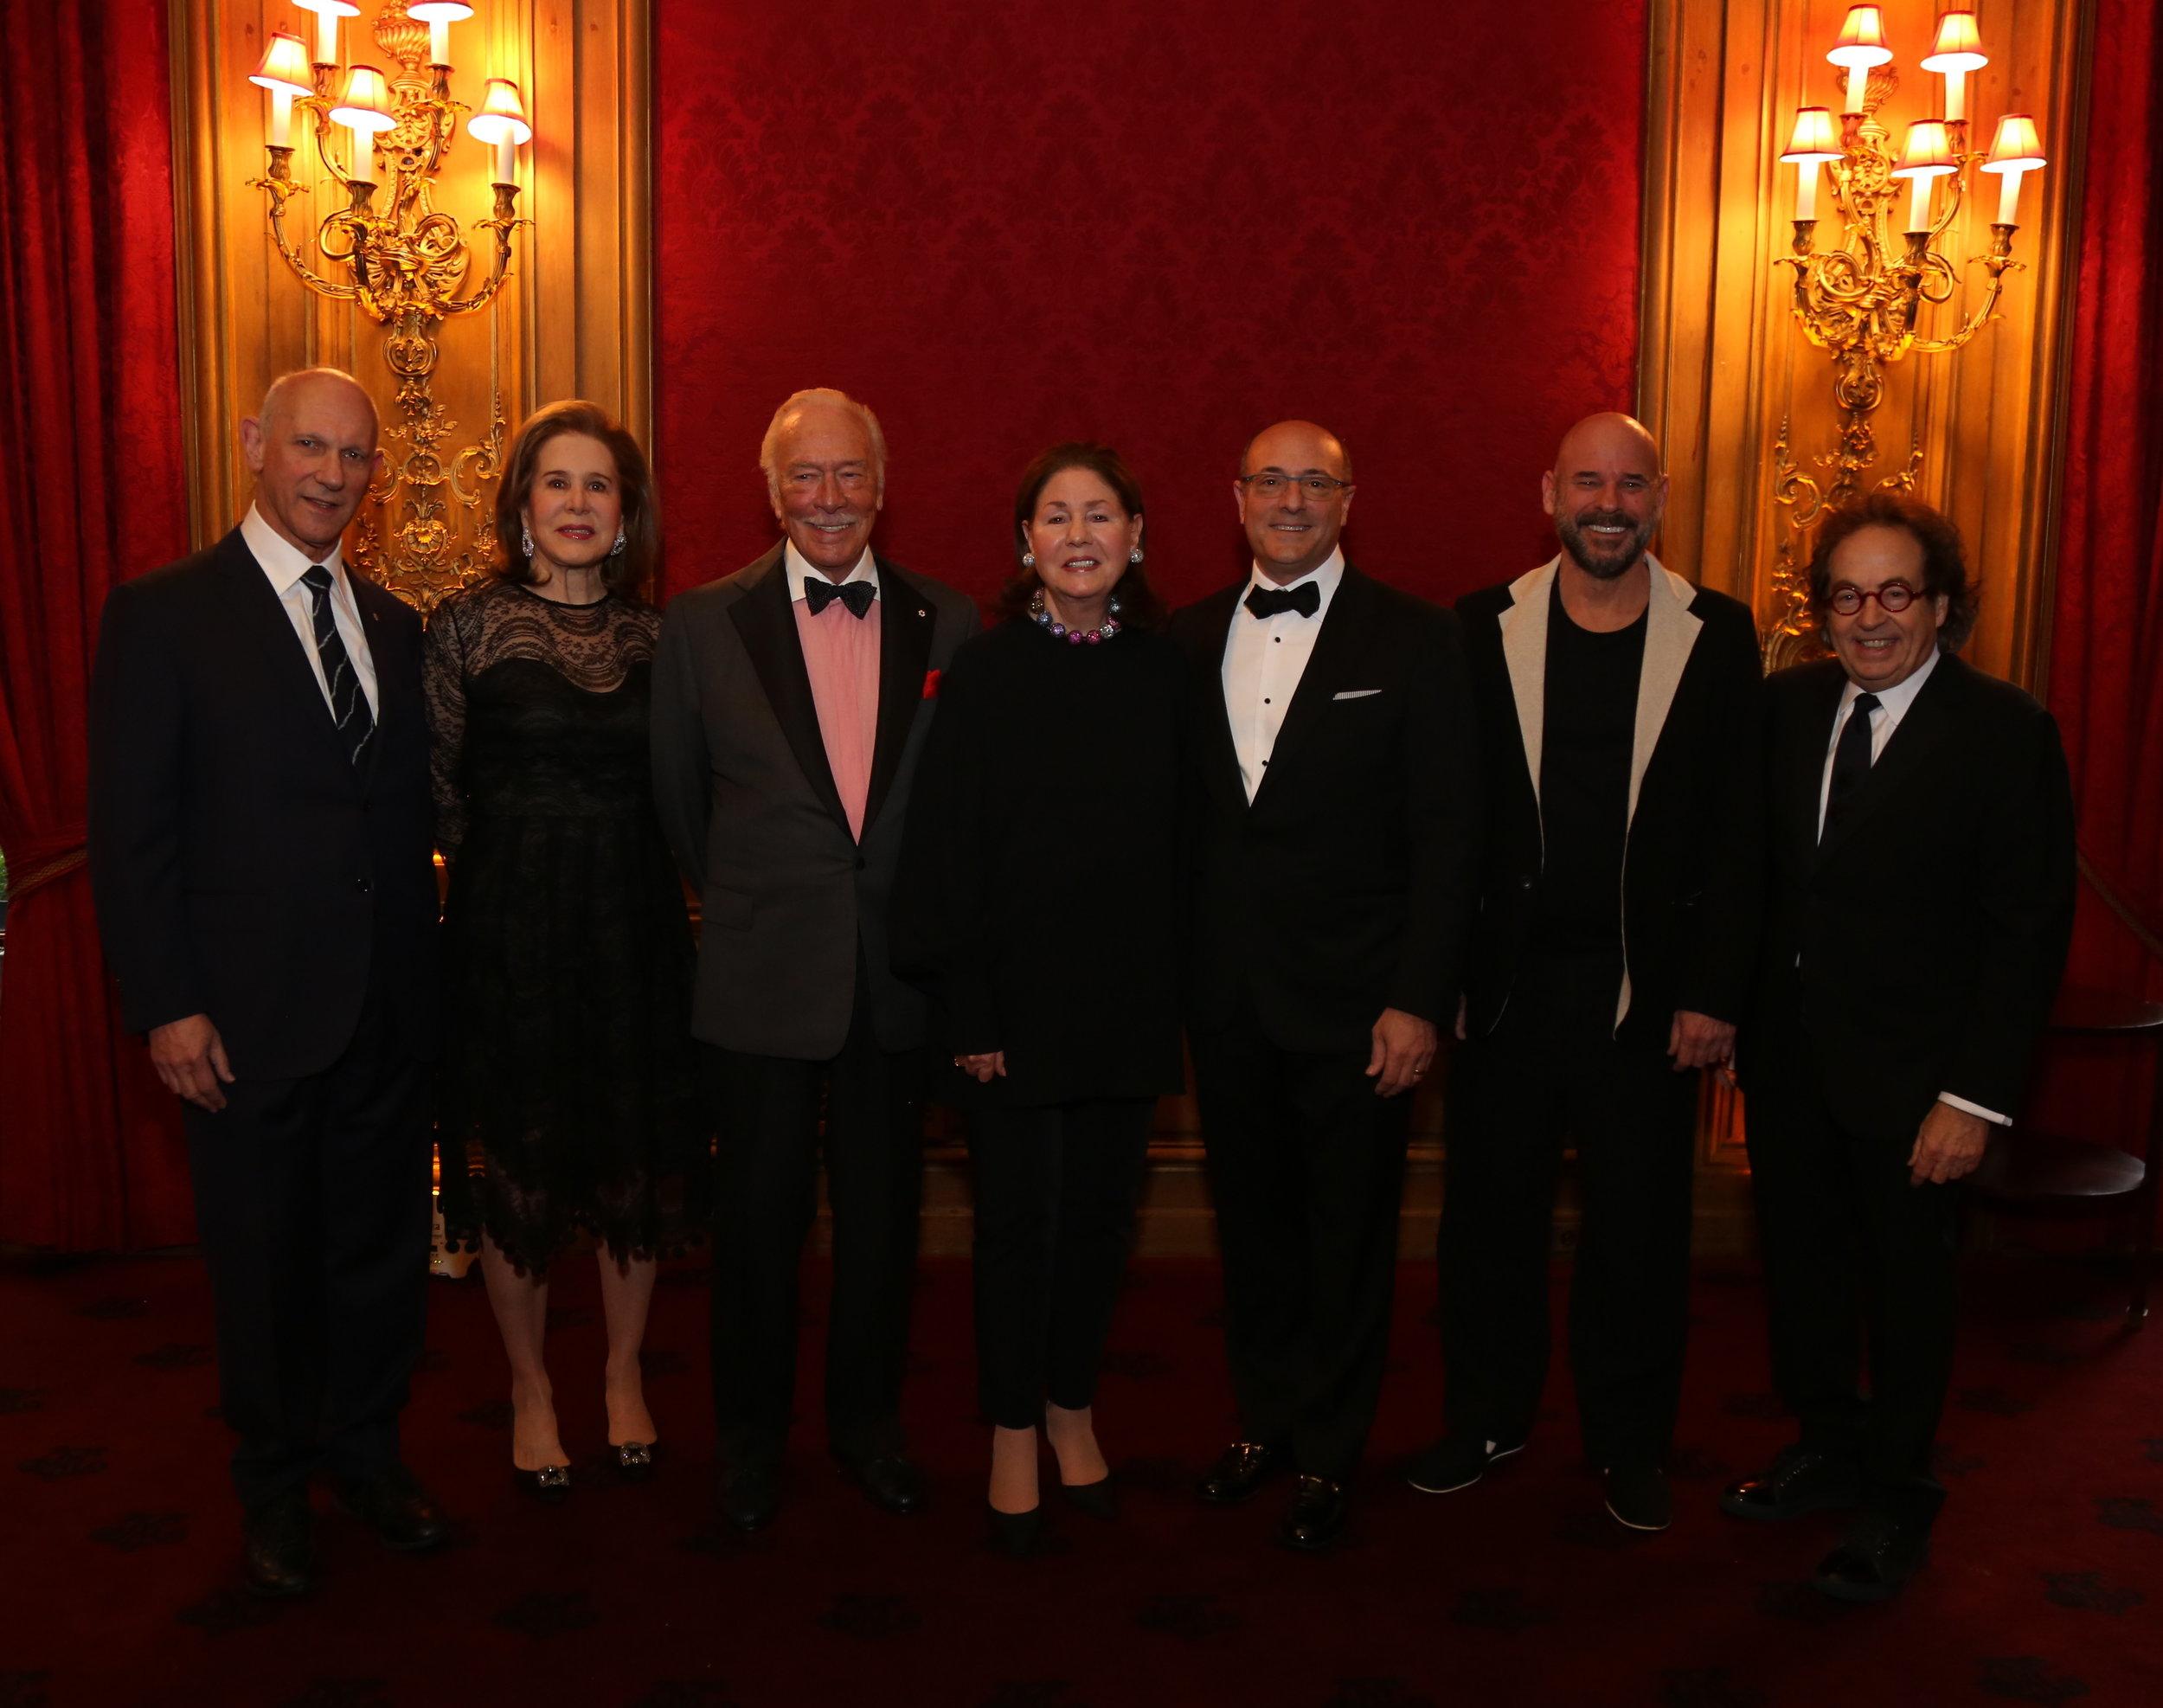 David Mirvish, Judy Ney, Christopher Plummer, Jo Carole Lauder, Martin Katz, Guy Laliberté, Jay Smith